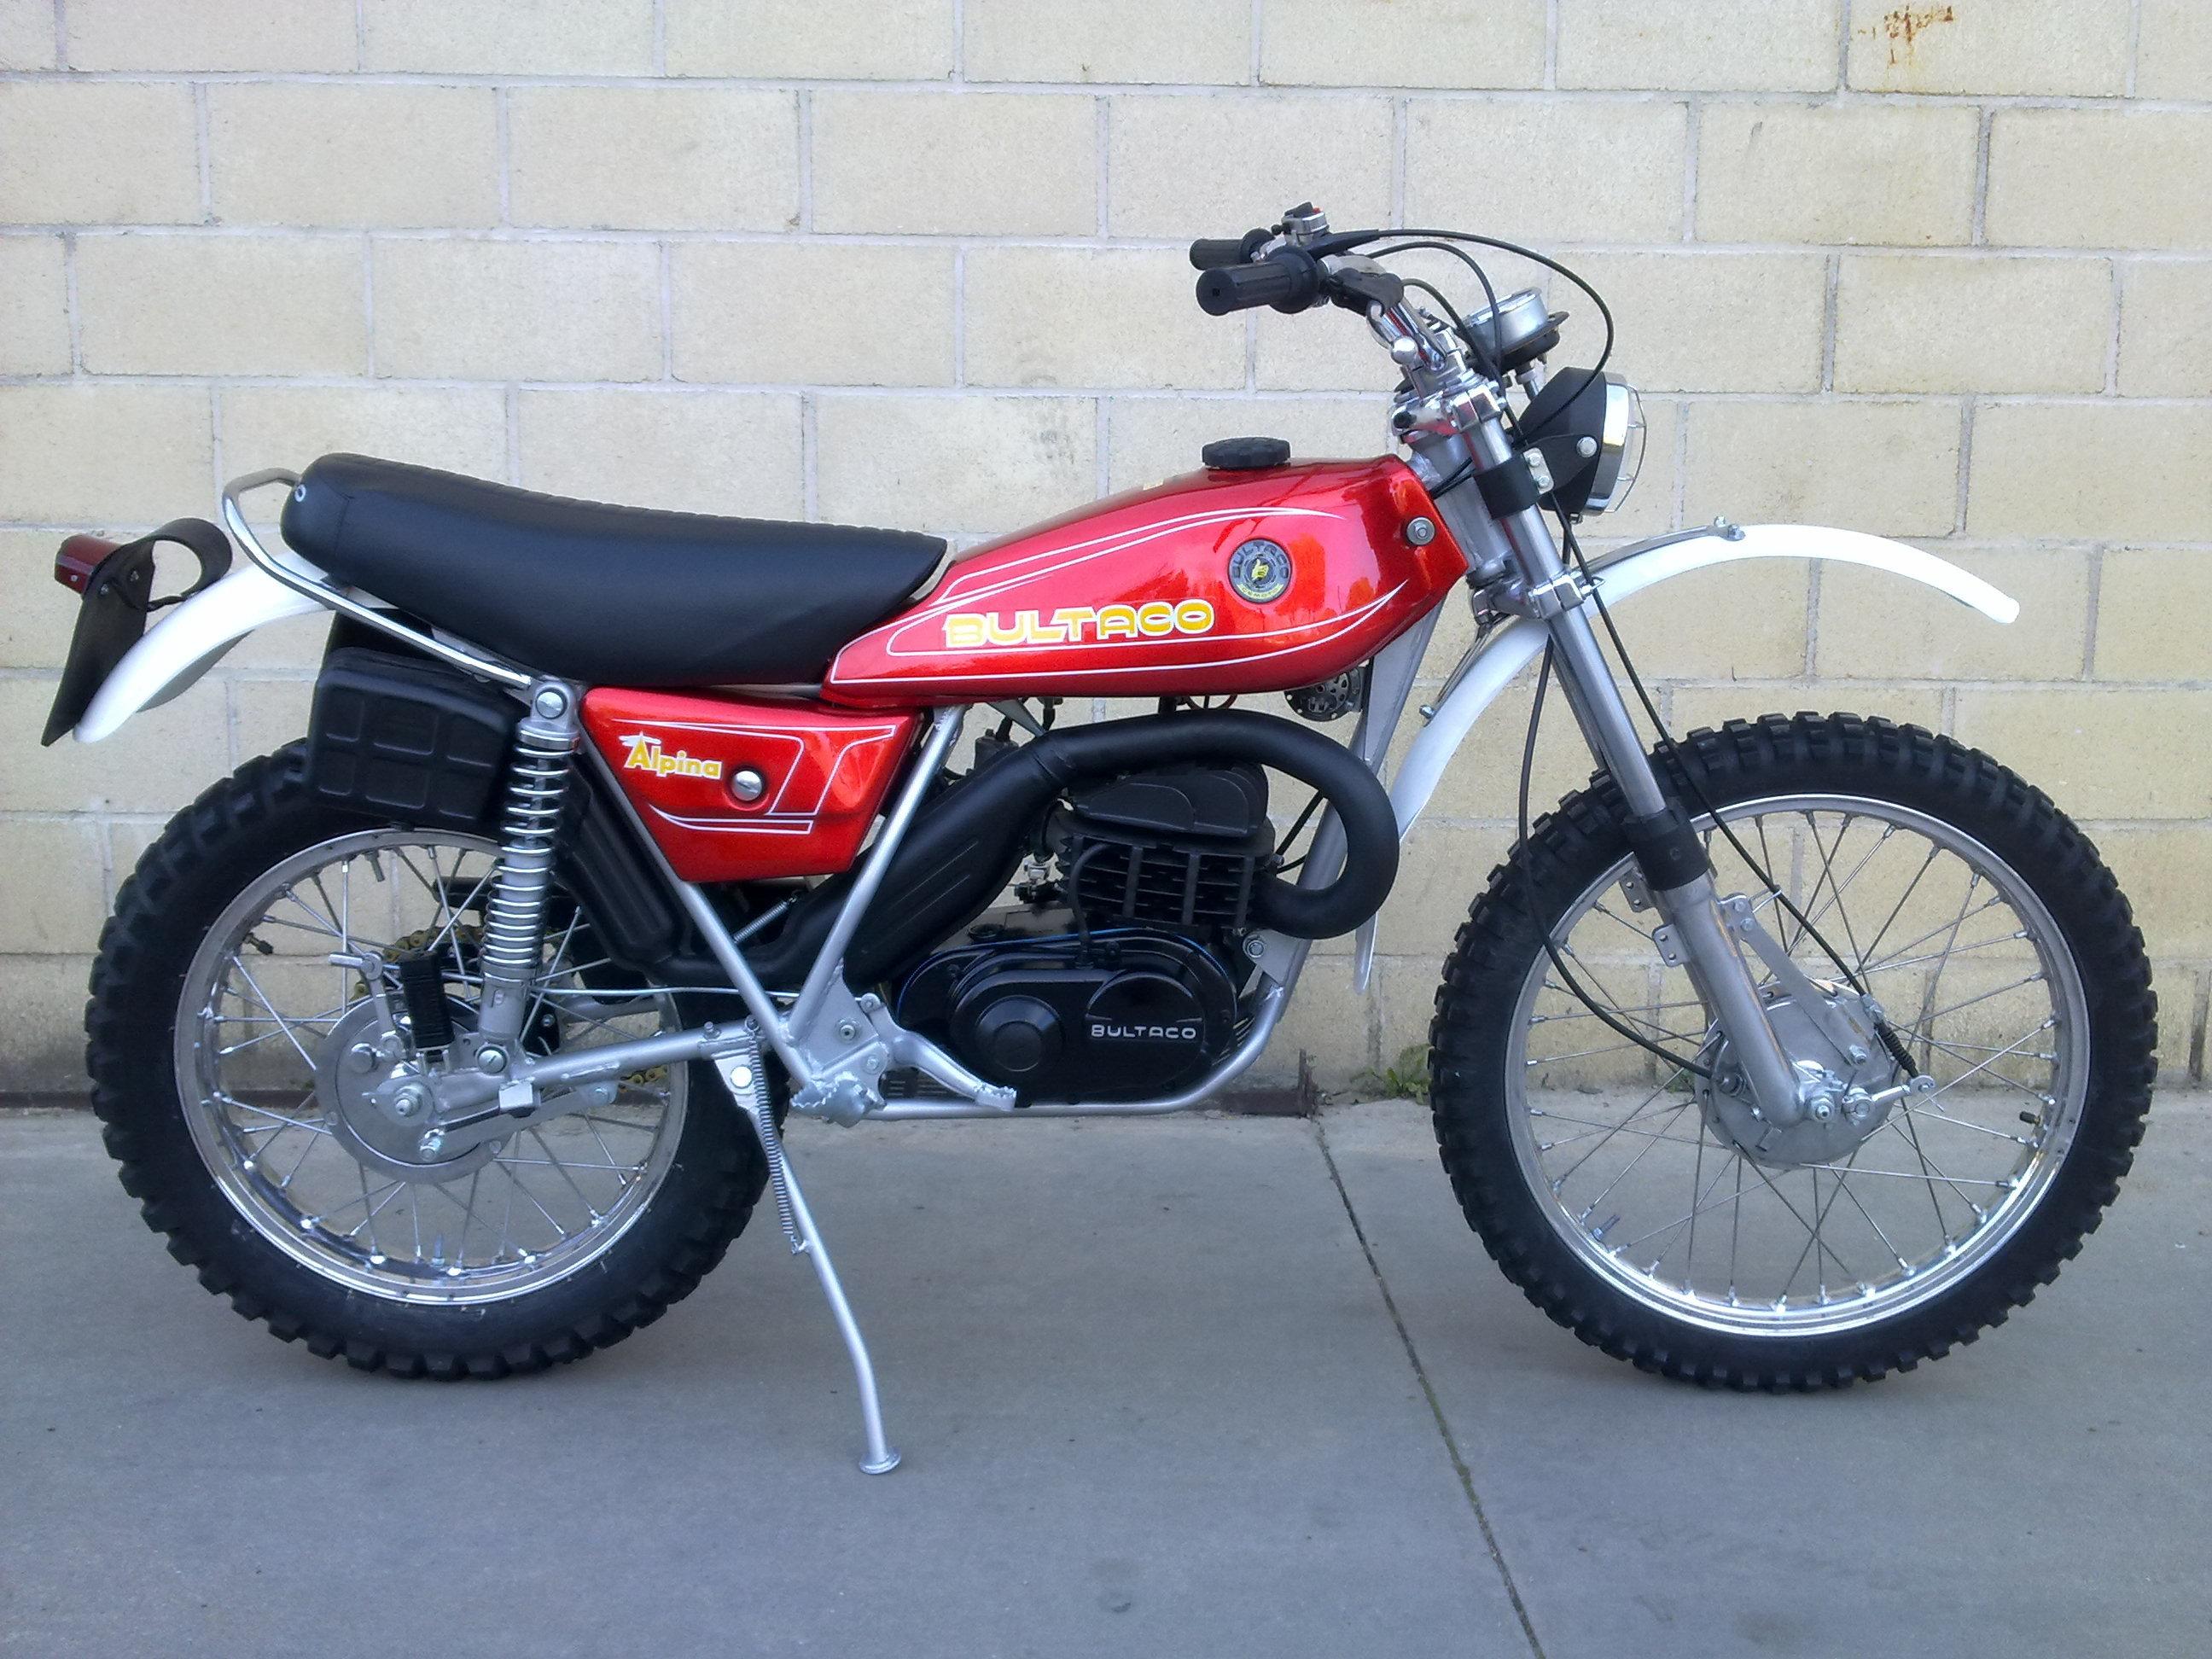 Model 213 350cc 1979